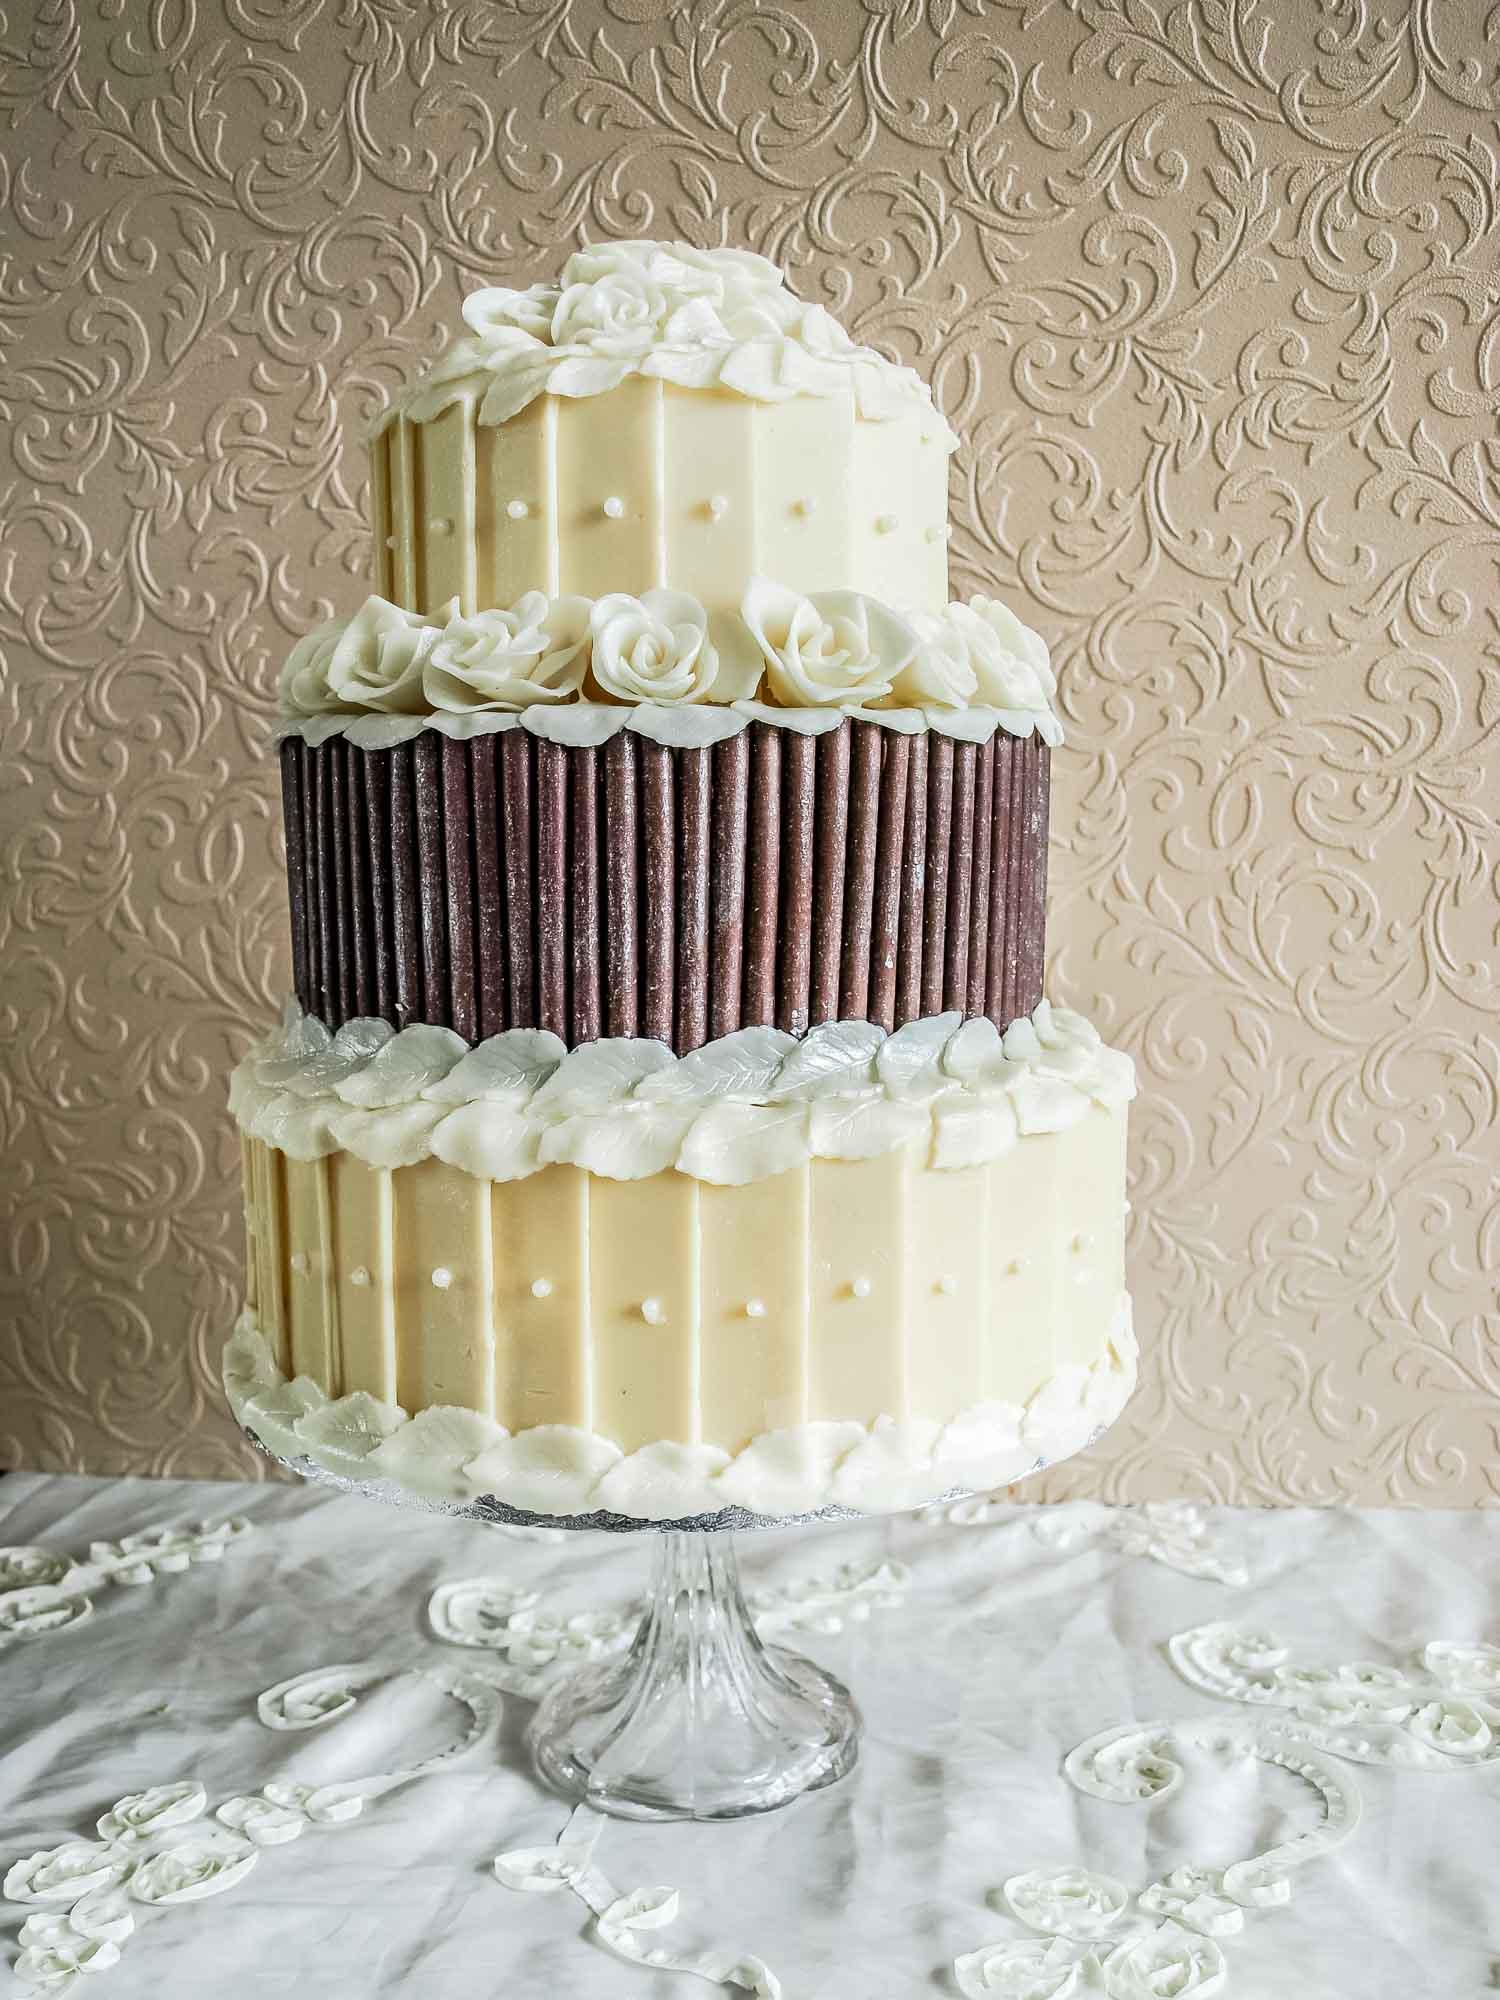 Cake Indulgence – Artisan Chocolate Wedding Cakes and Patisserie